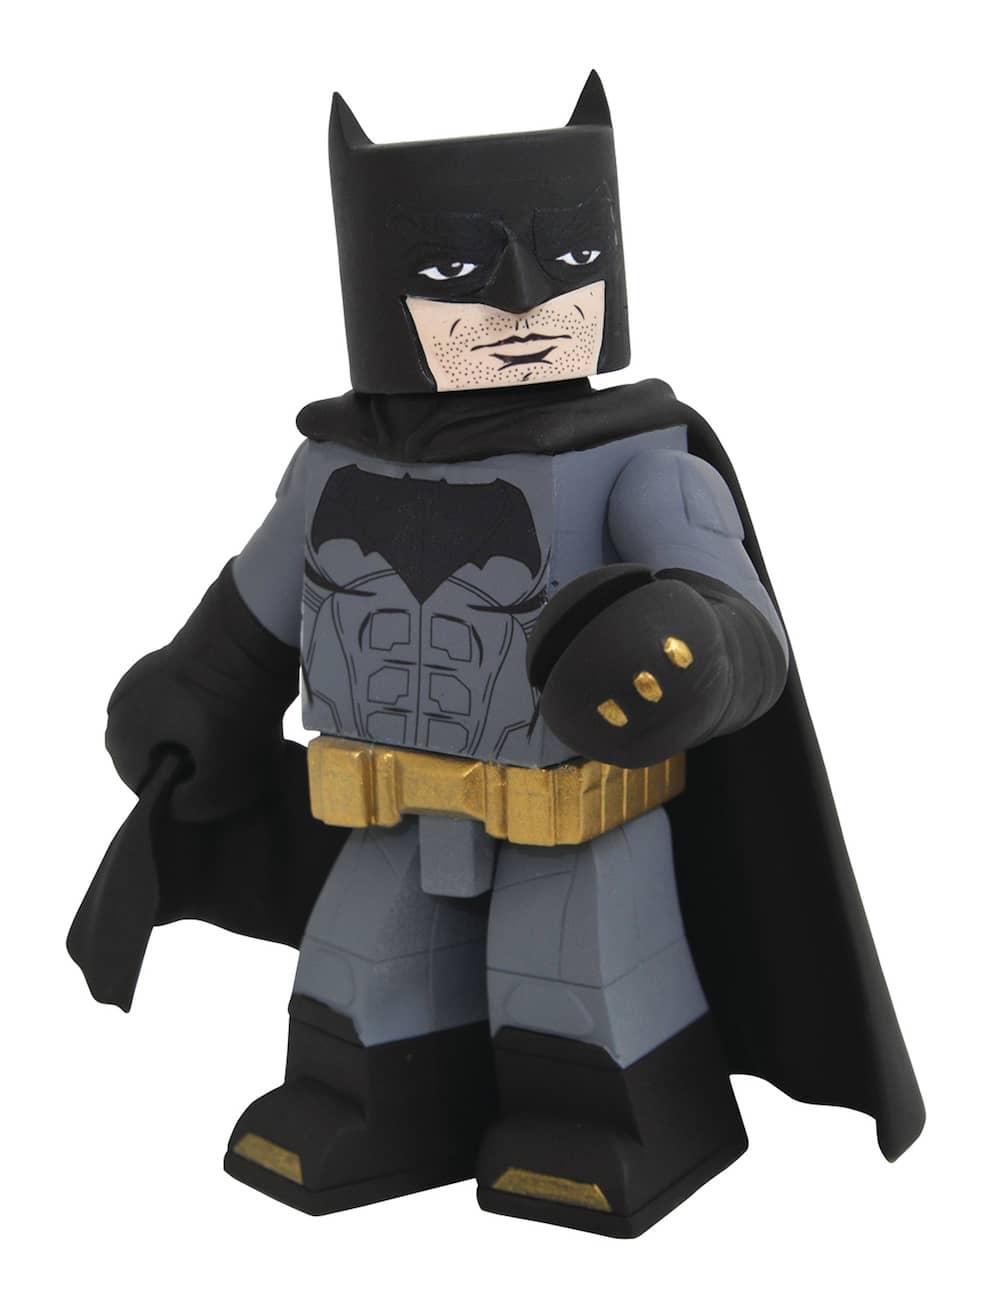 BATMAN BLACK FIGURA 10 CM VINIMATES VINYL FIGURE DC COMICS